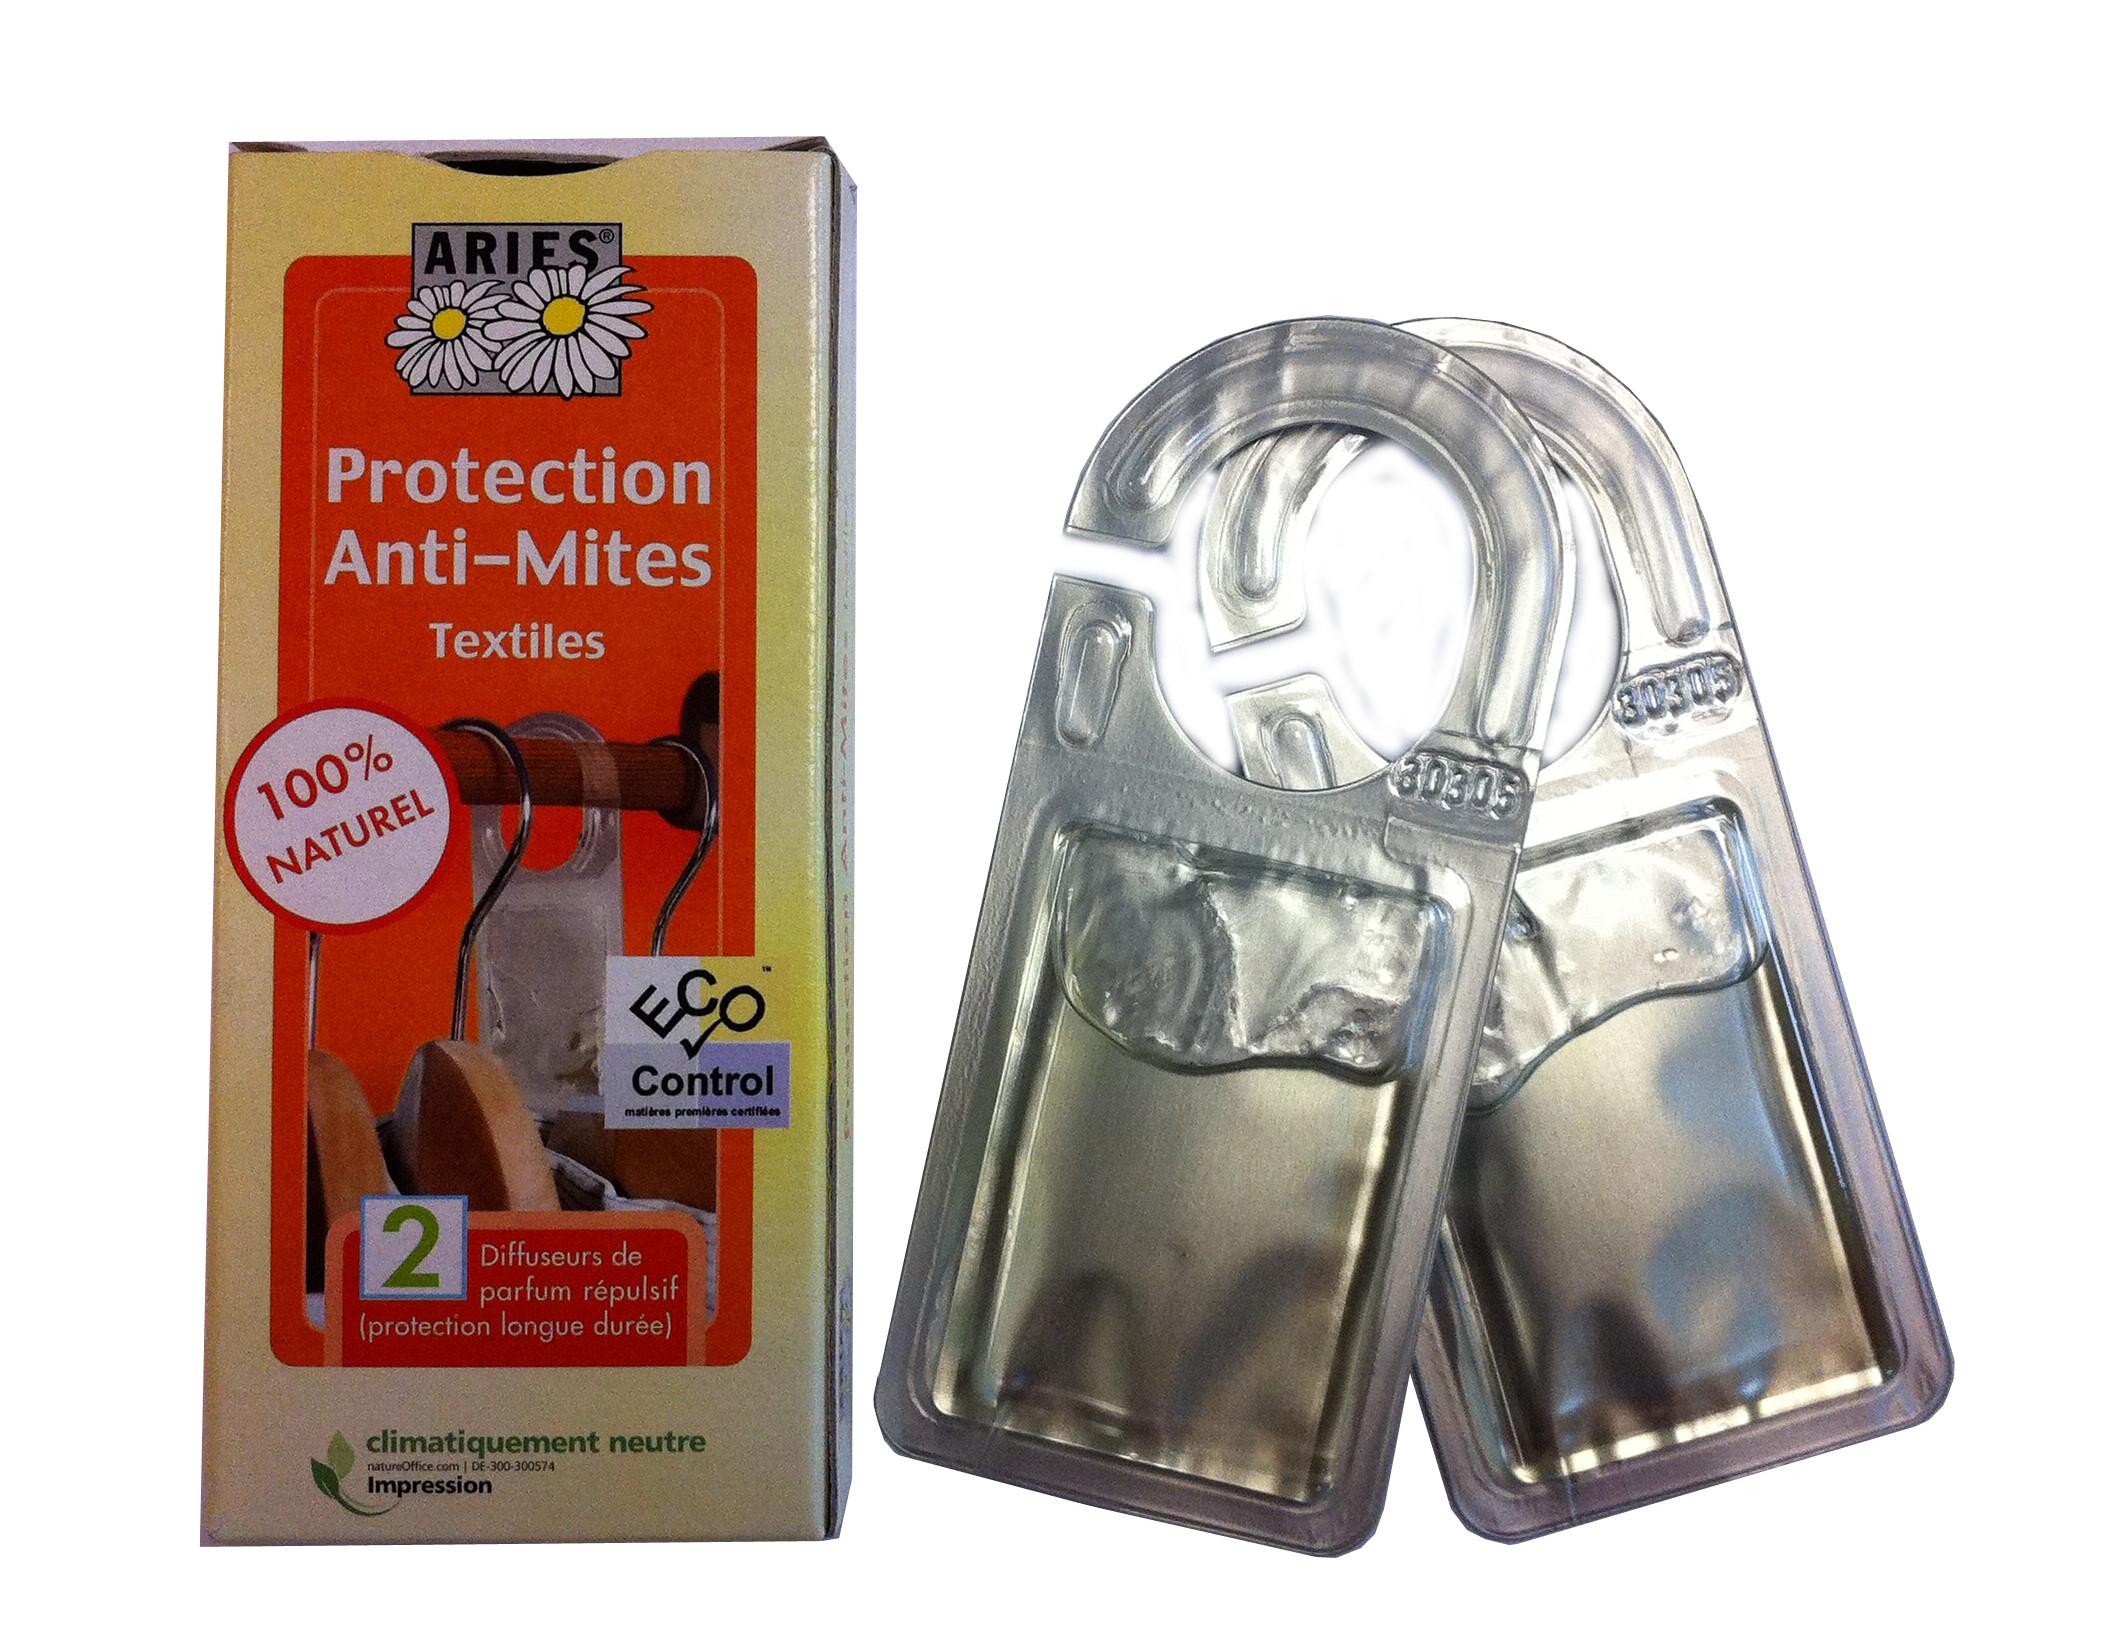 protection anti mites textiles 2 diffuseurs de r pulsif insecticides naturels droguerie. Black Bedroom Furniture Sets. Home Design Ideas